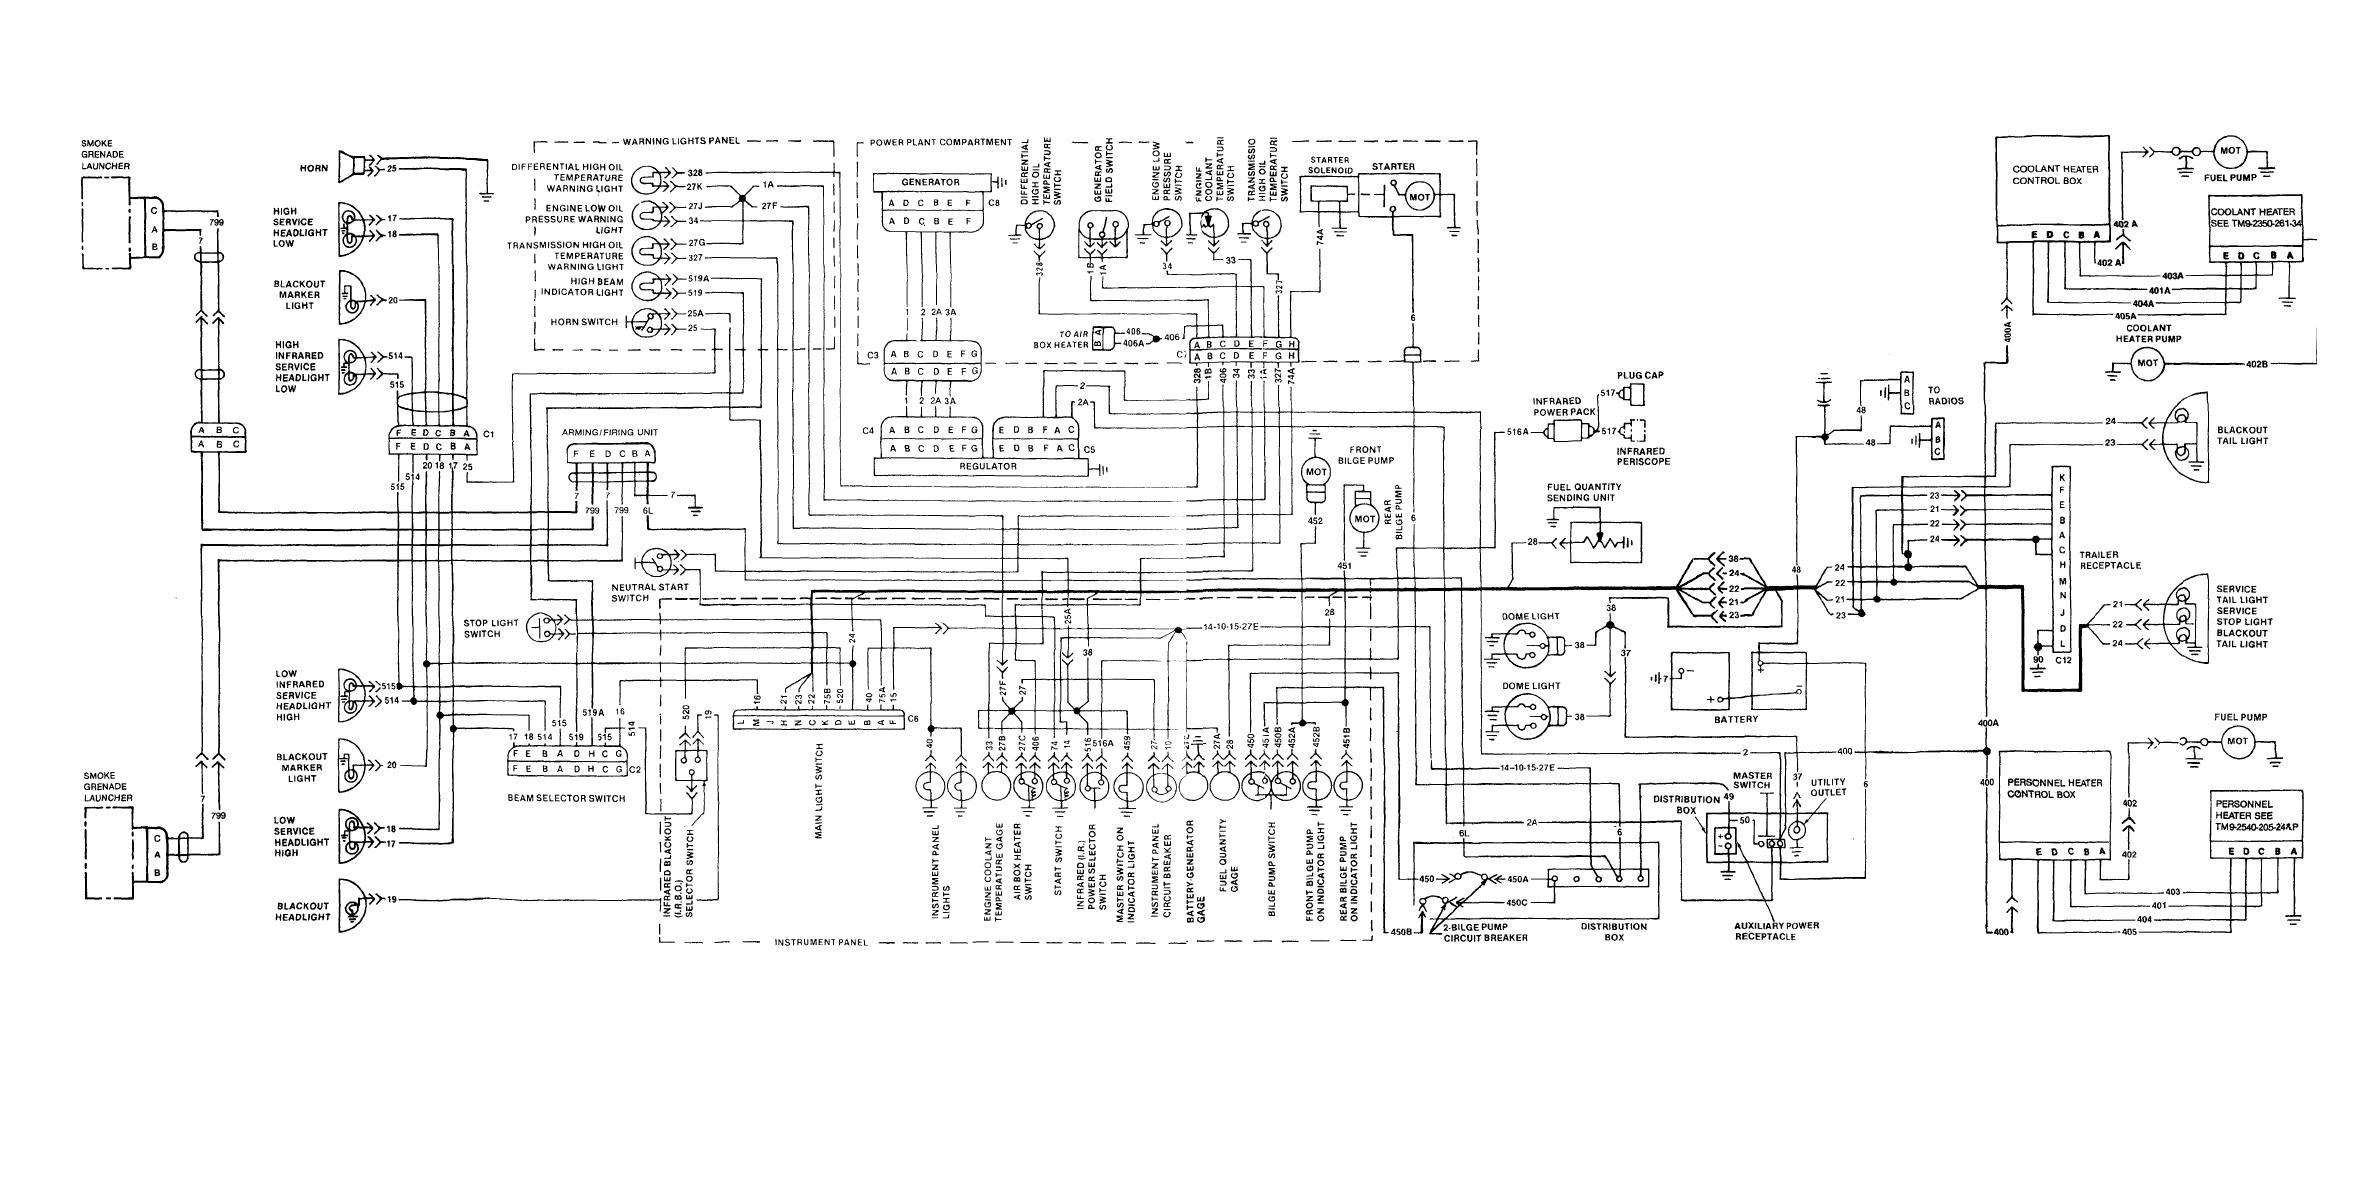 limitorque l120 wiring diagram jh davidforlife de \u2022 RCS Mar 50 2 Electric Actuator Wiring Diagram limitorque l120 wiring schematic wiring diagrams schematic rh 70 kuschzeichner de limitorque l120 40 wiring